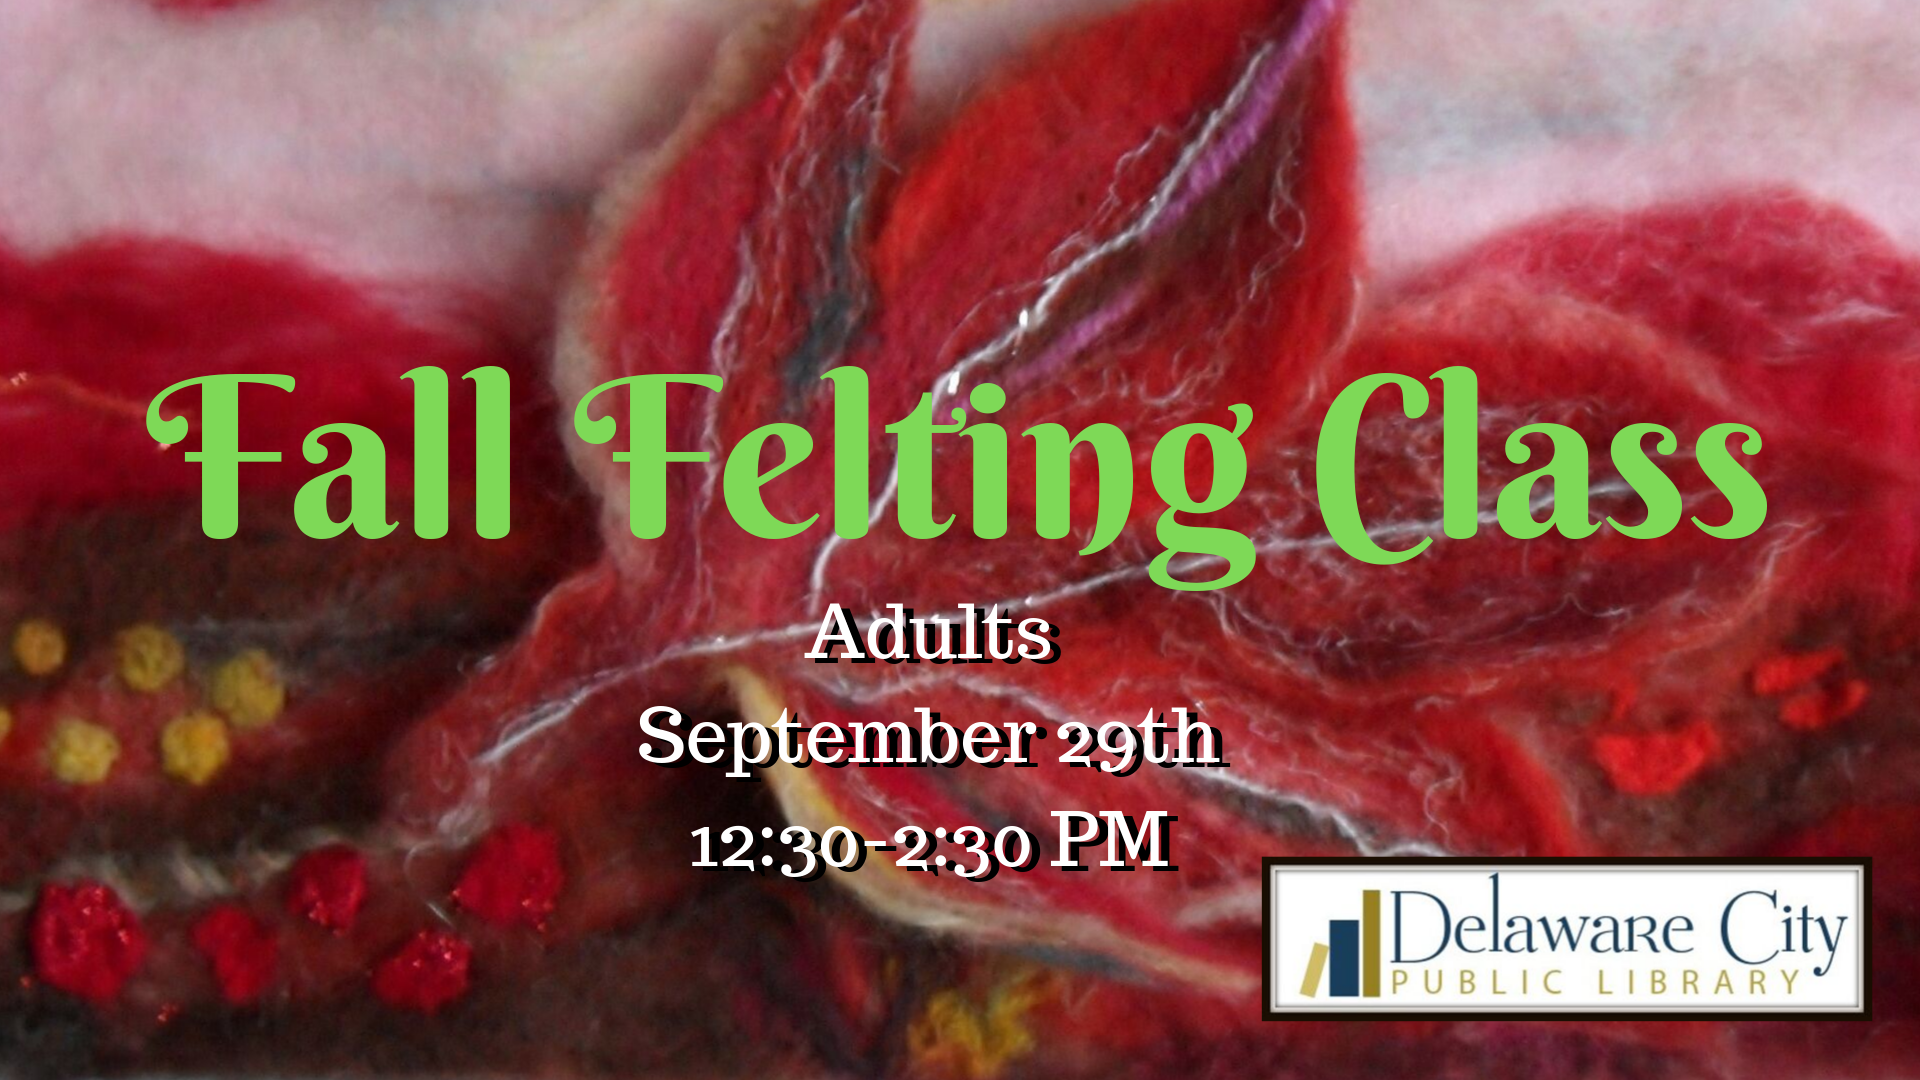 Fall Felting Class